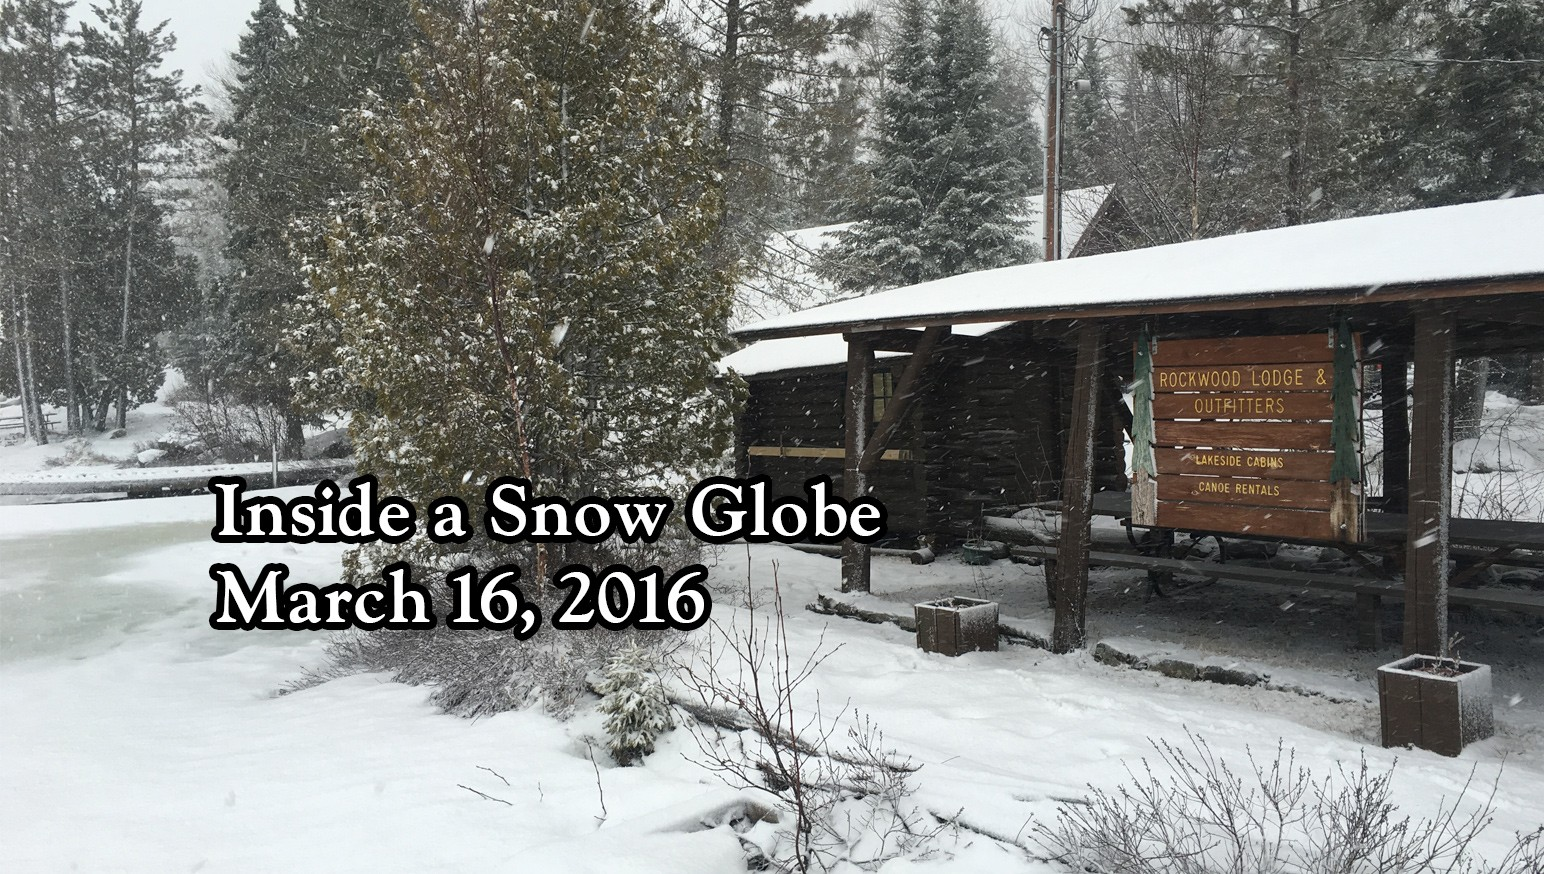 Inside a Snow Globe March 16, 2016